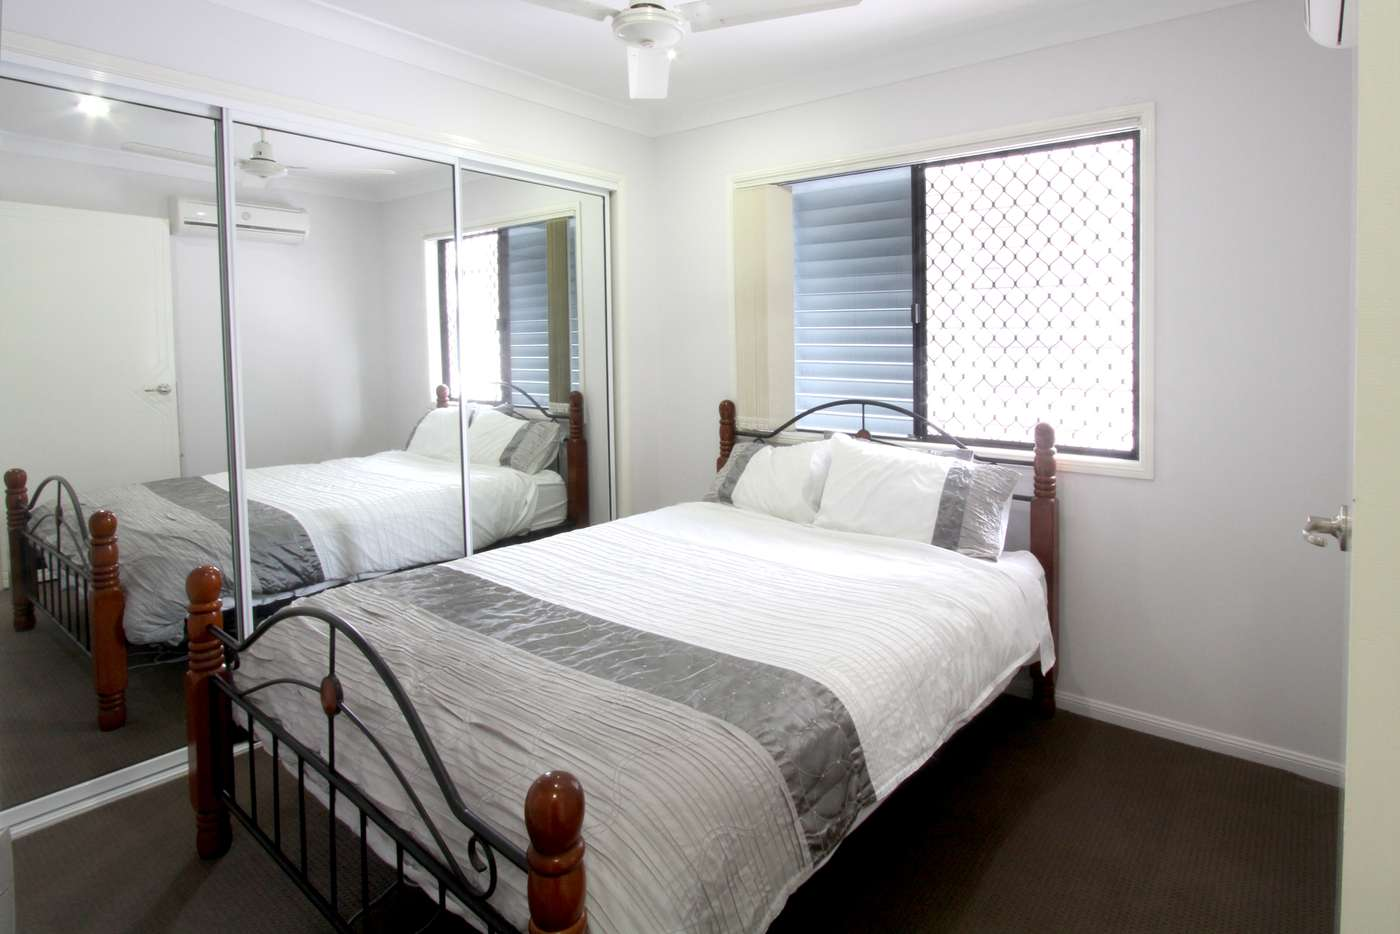 Sixth view of Homely unit listing, 16B Hamlet Street, Mackay QLD 4740